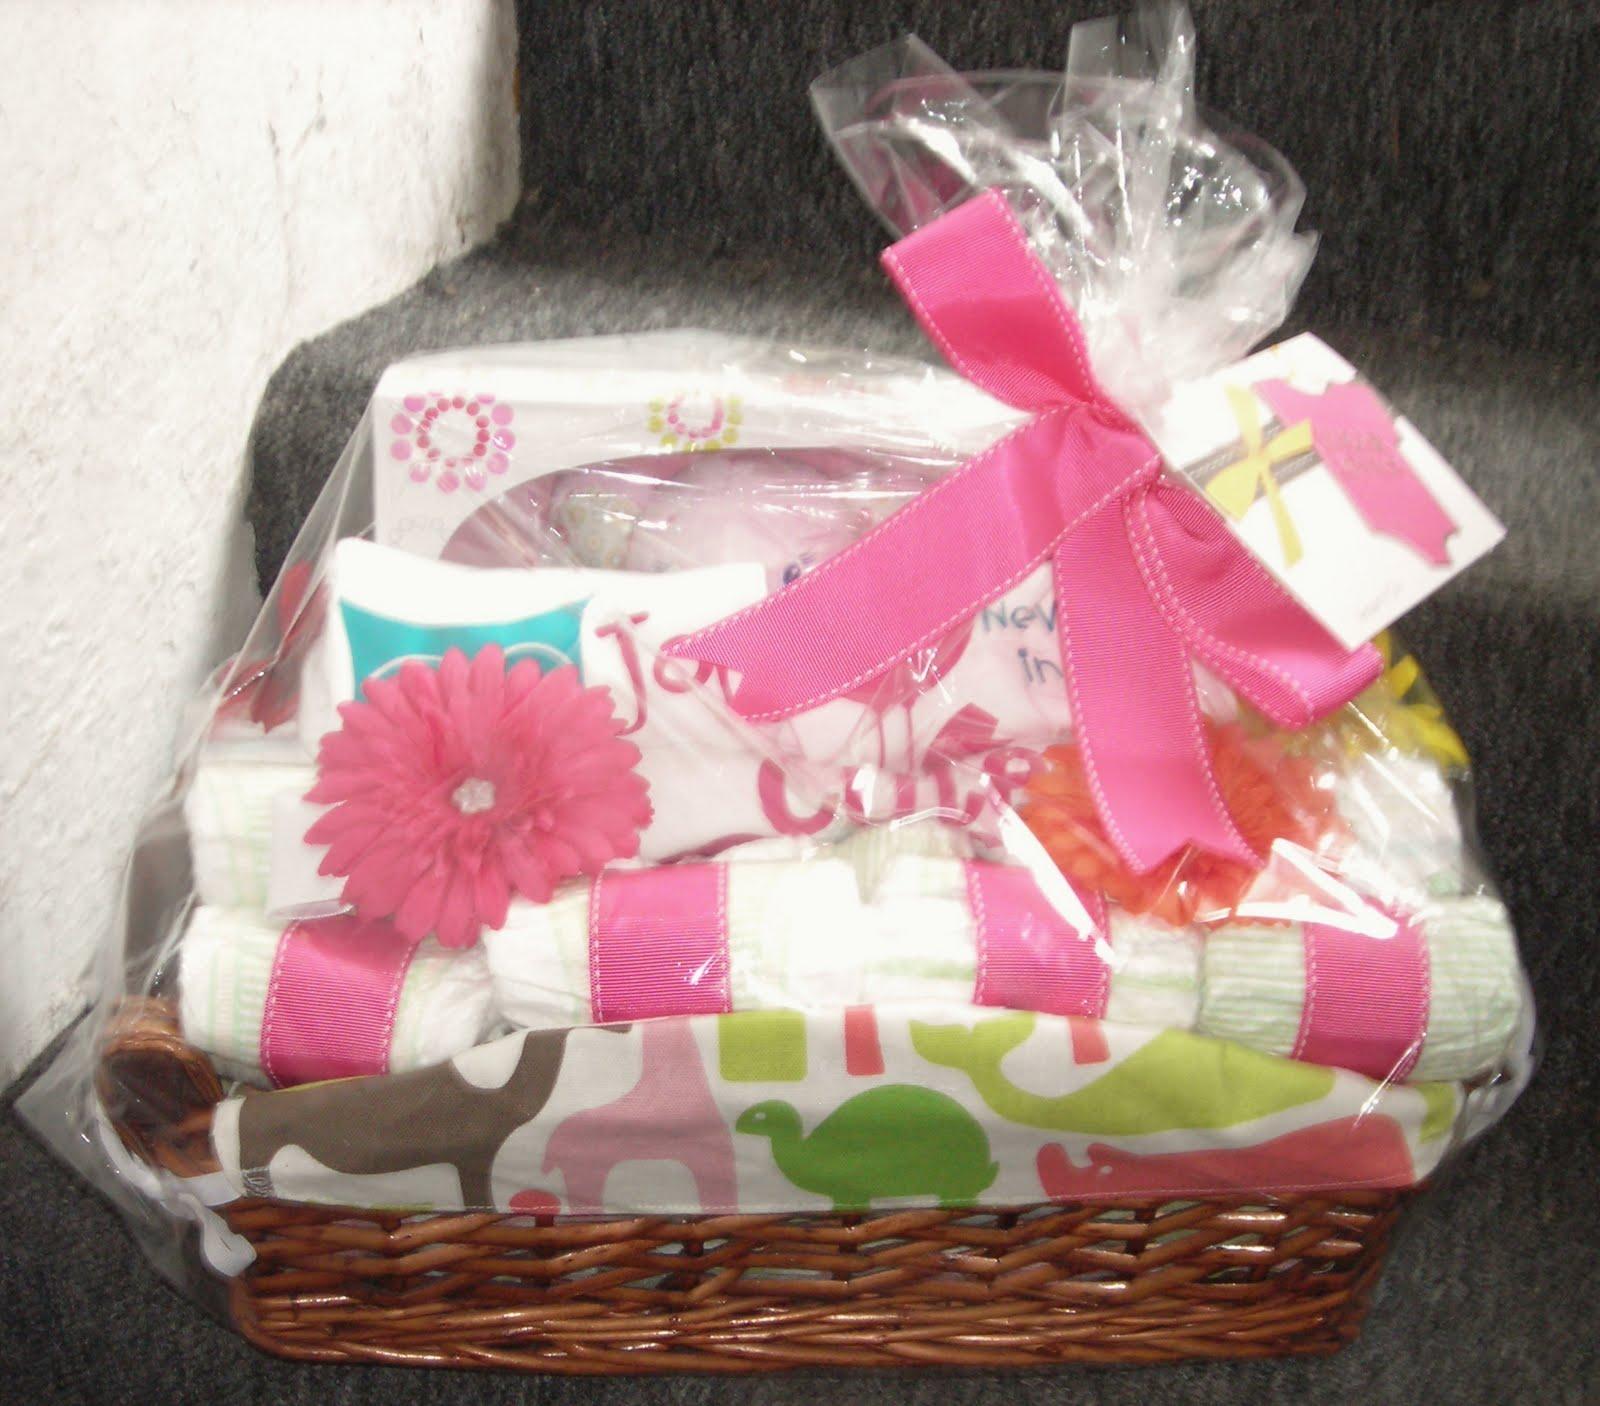 Life In The Motherhood: Baby Shower Gift Basket